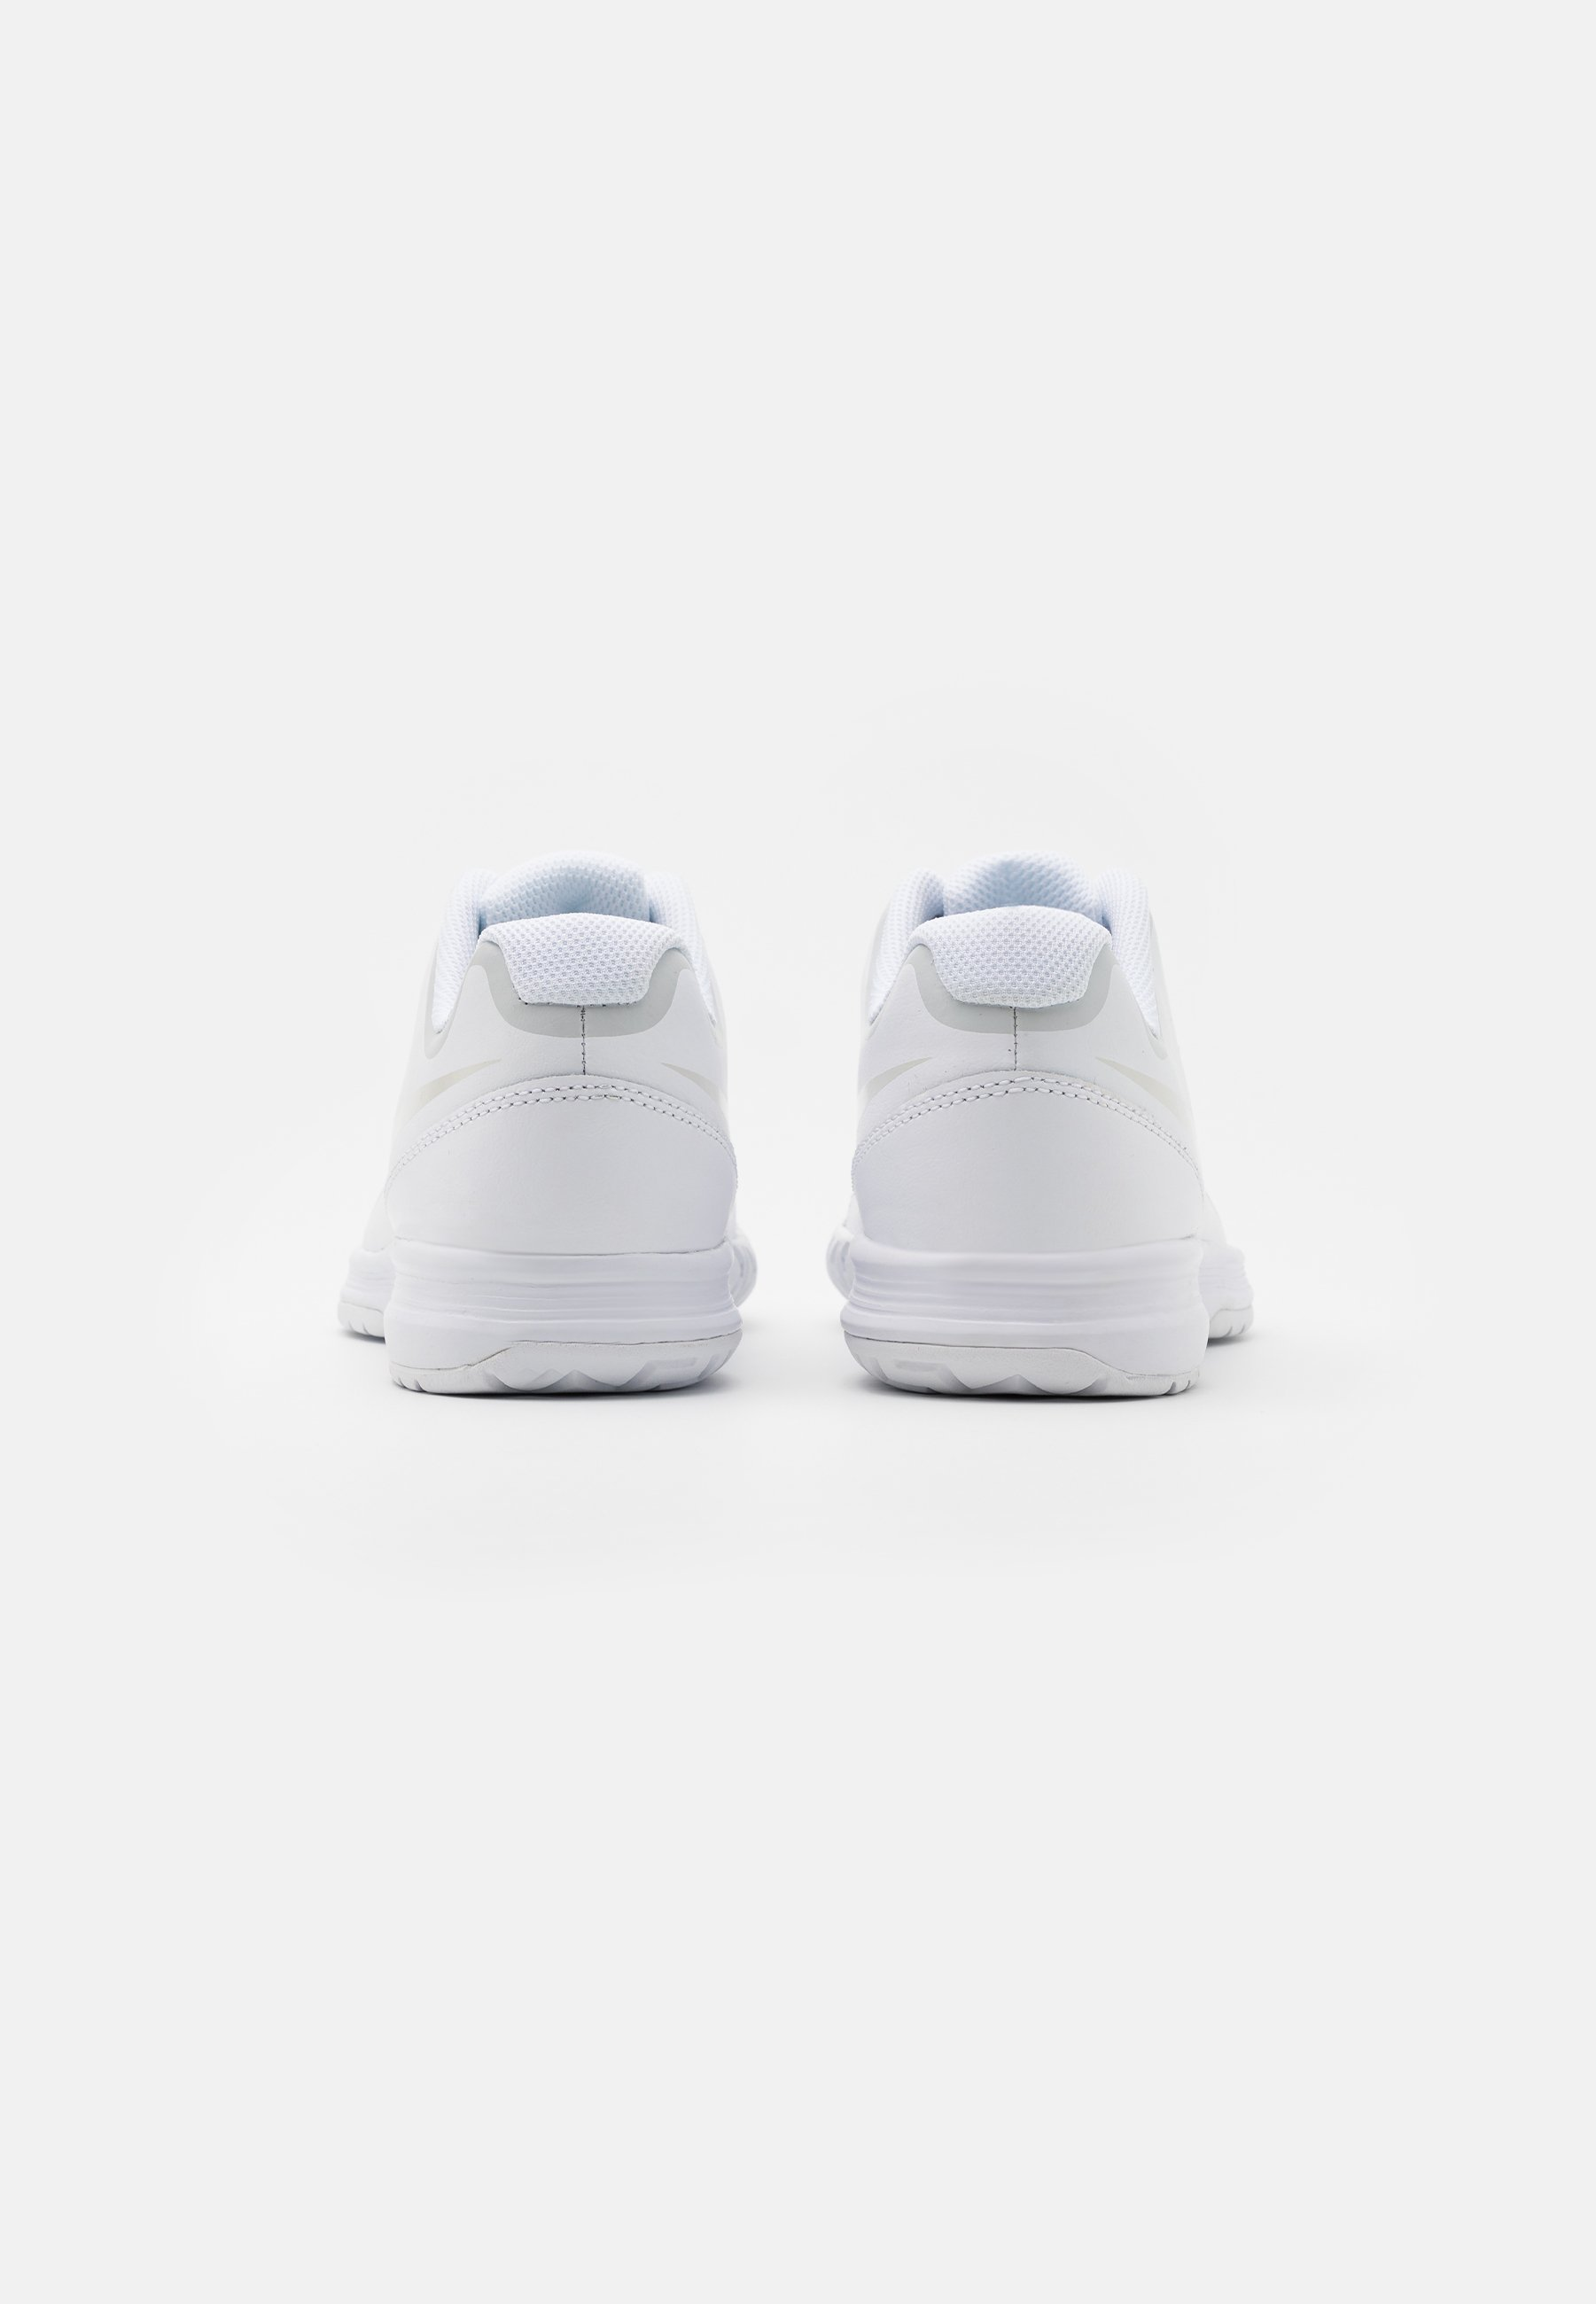 Scarpe da donna Nike Performance WOMENS VAPOR COURT SHOE Scarpe da tennis per tutte le superfici white/light bone/pure platinum